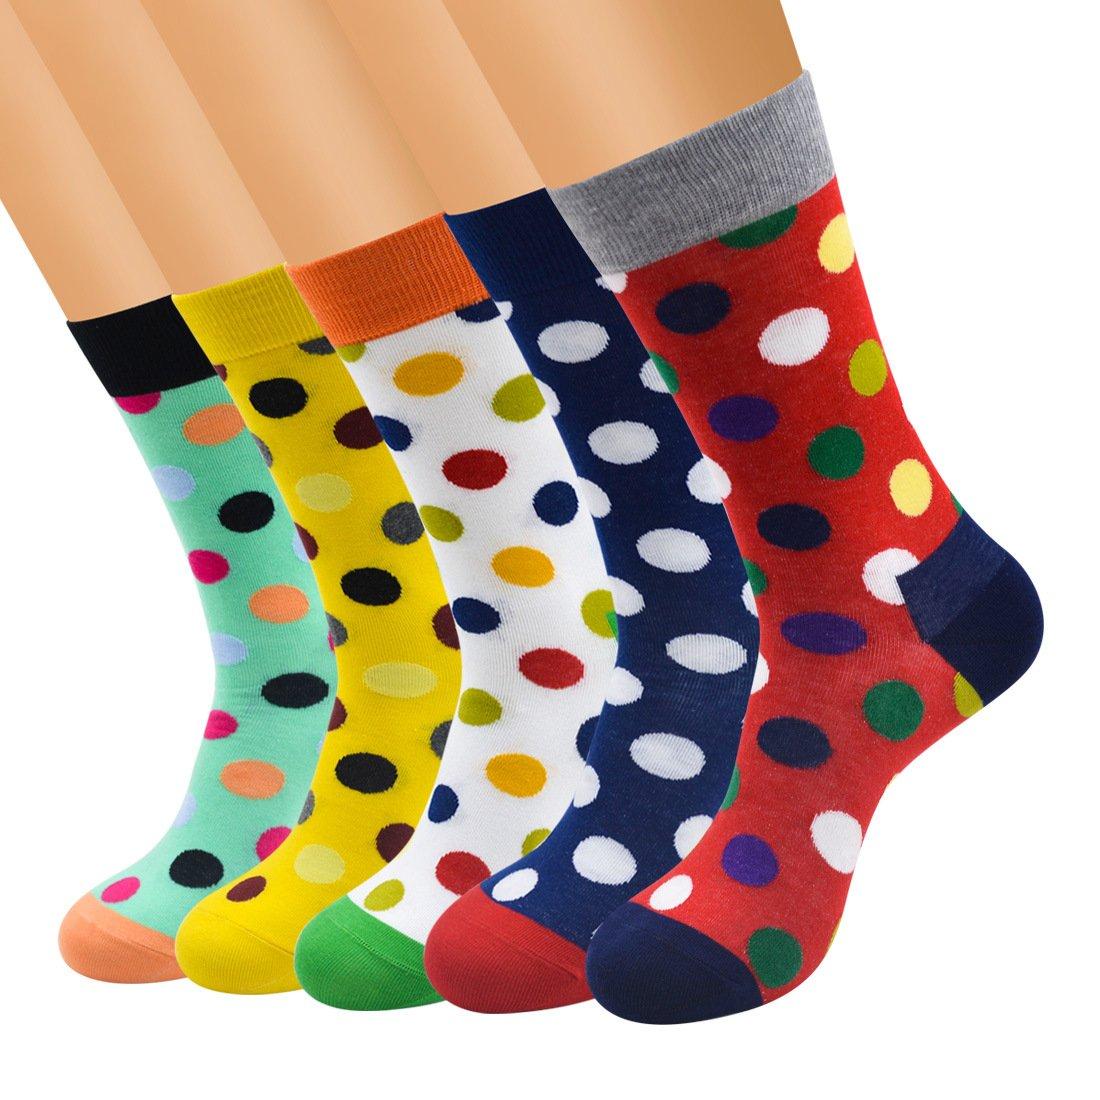 Women Slipper Socks 5 Pairs Winter Super Soft Cozy Warm Cute Casual Crew Socks (Style A-5 Pairs)